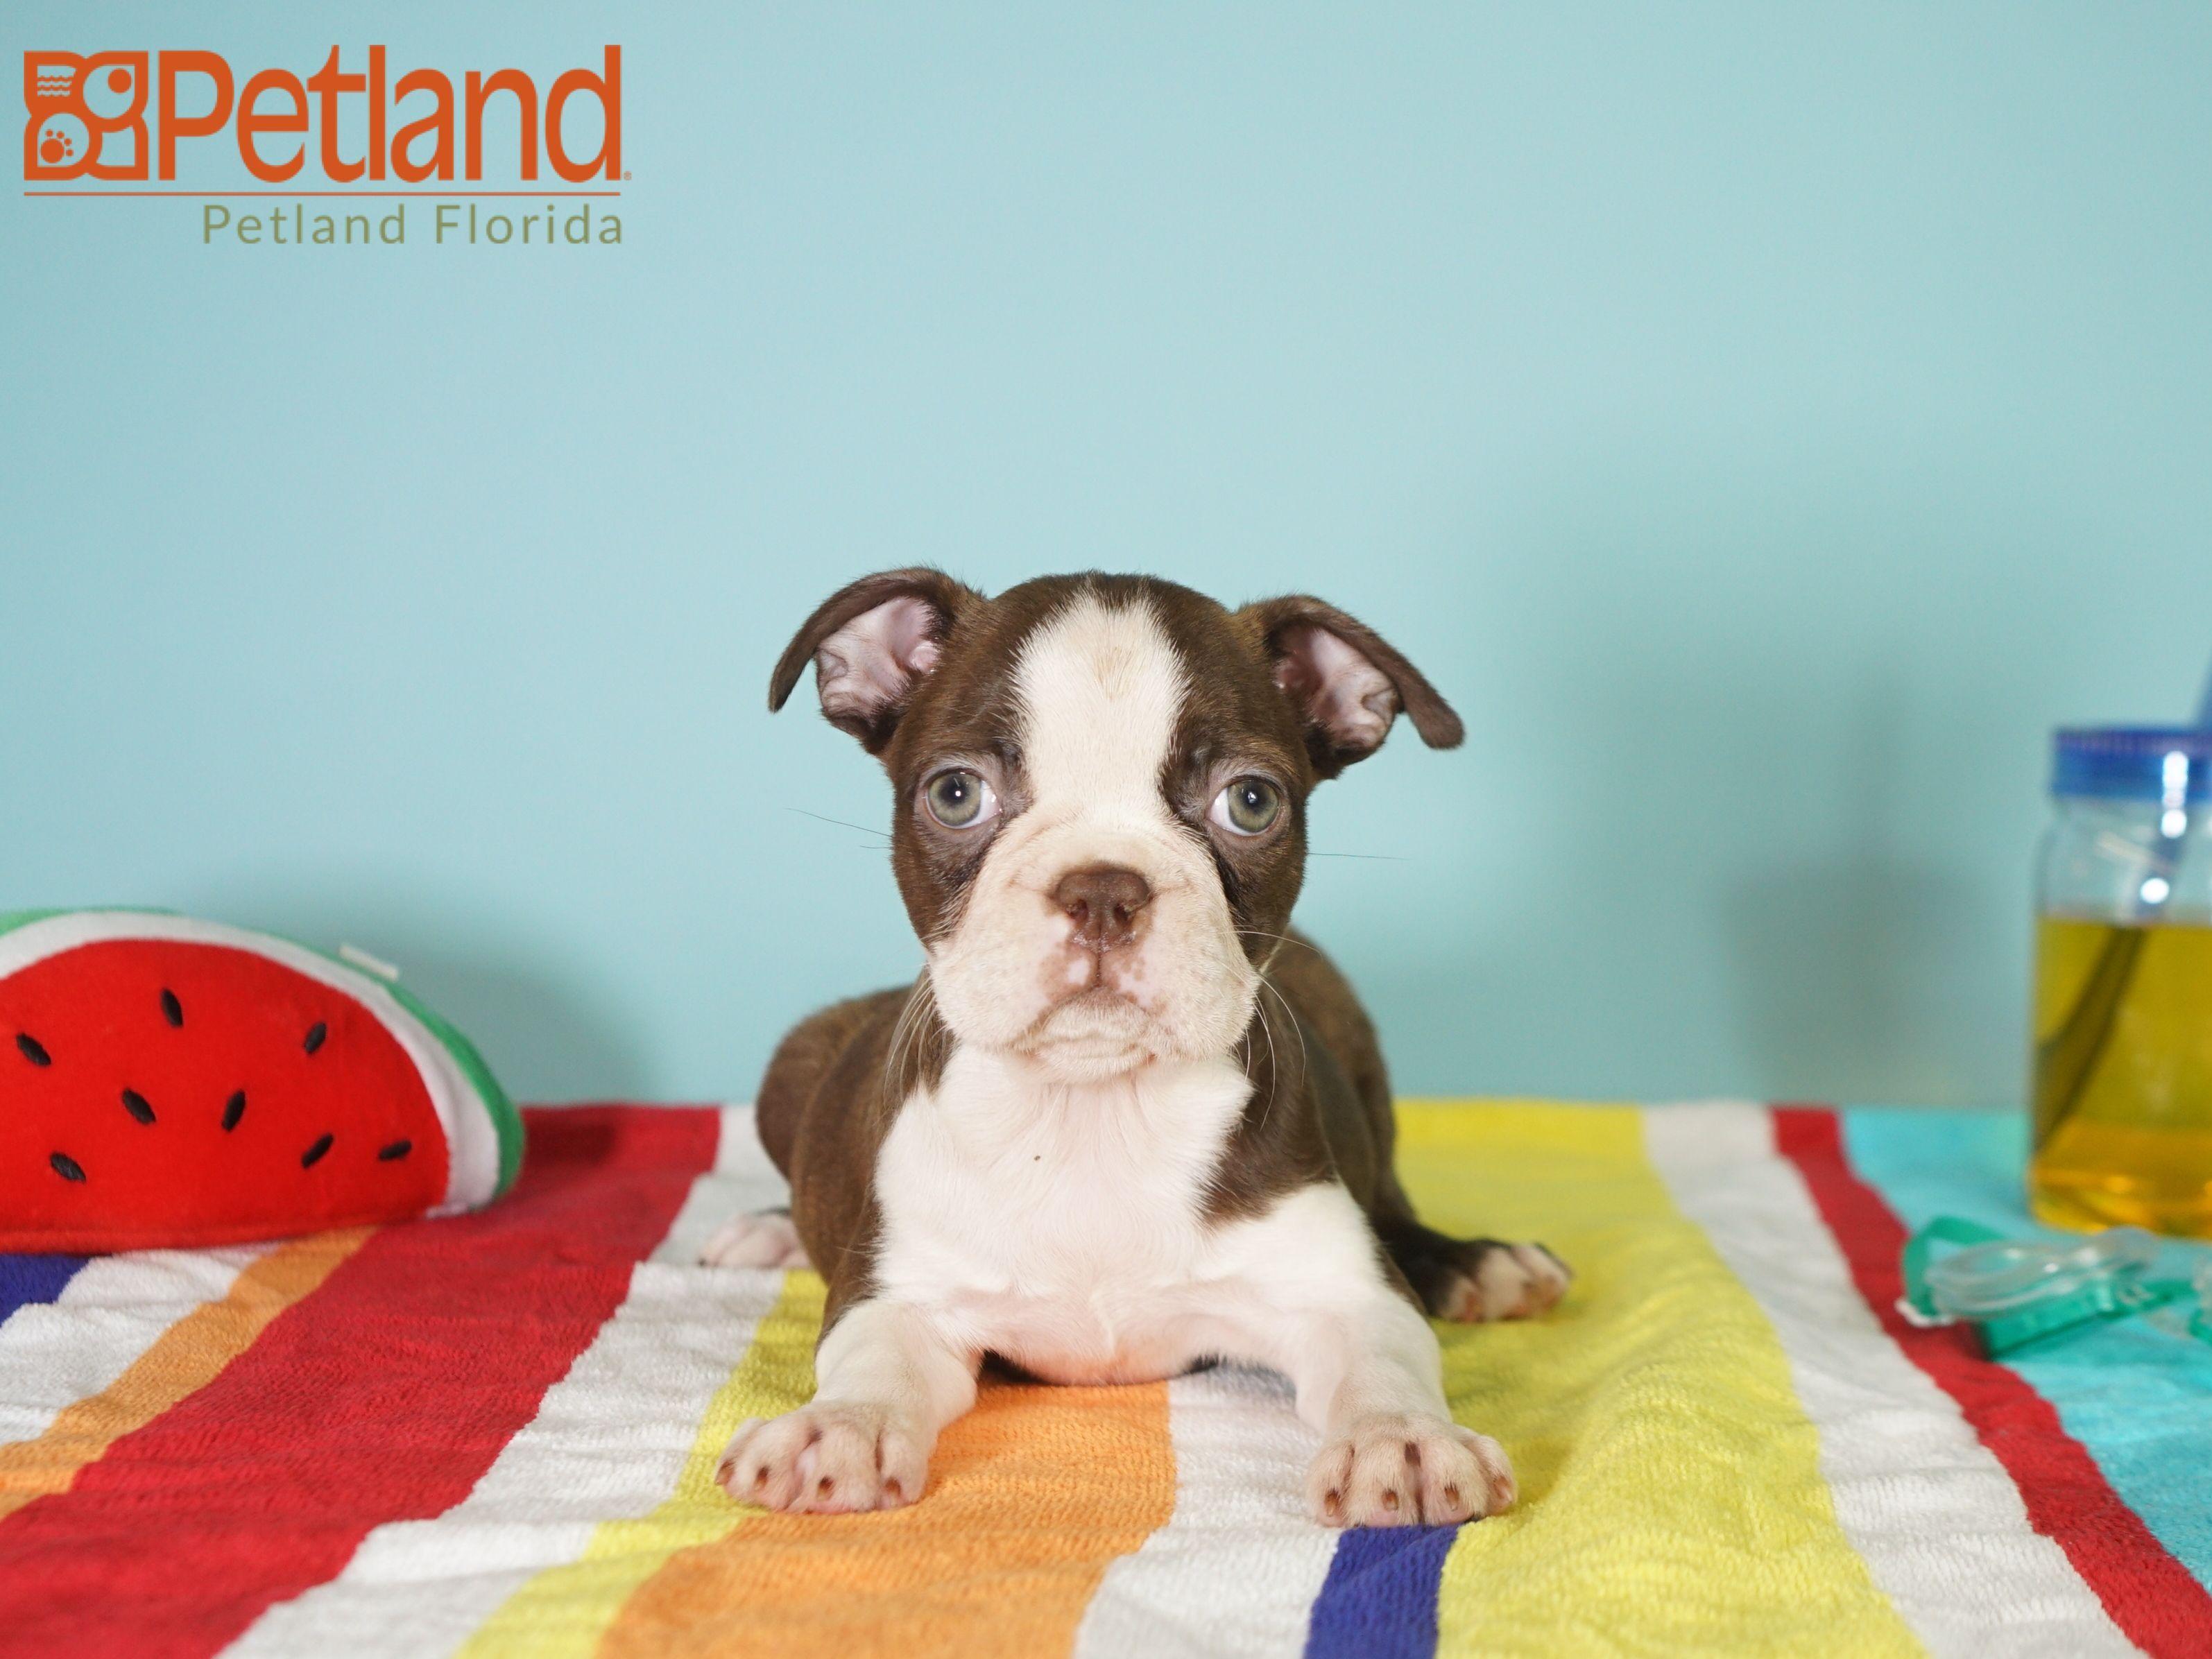 Petland Florida has Boston Terrier puppies for sale! Check